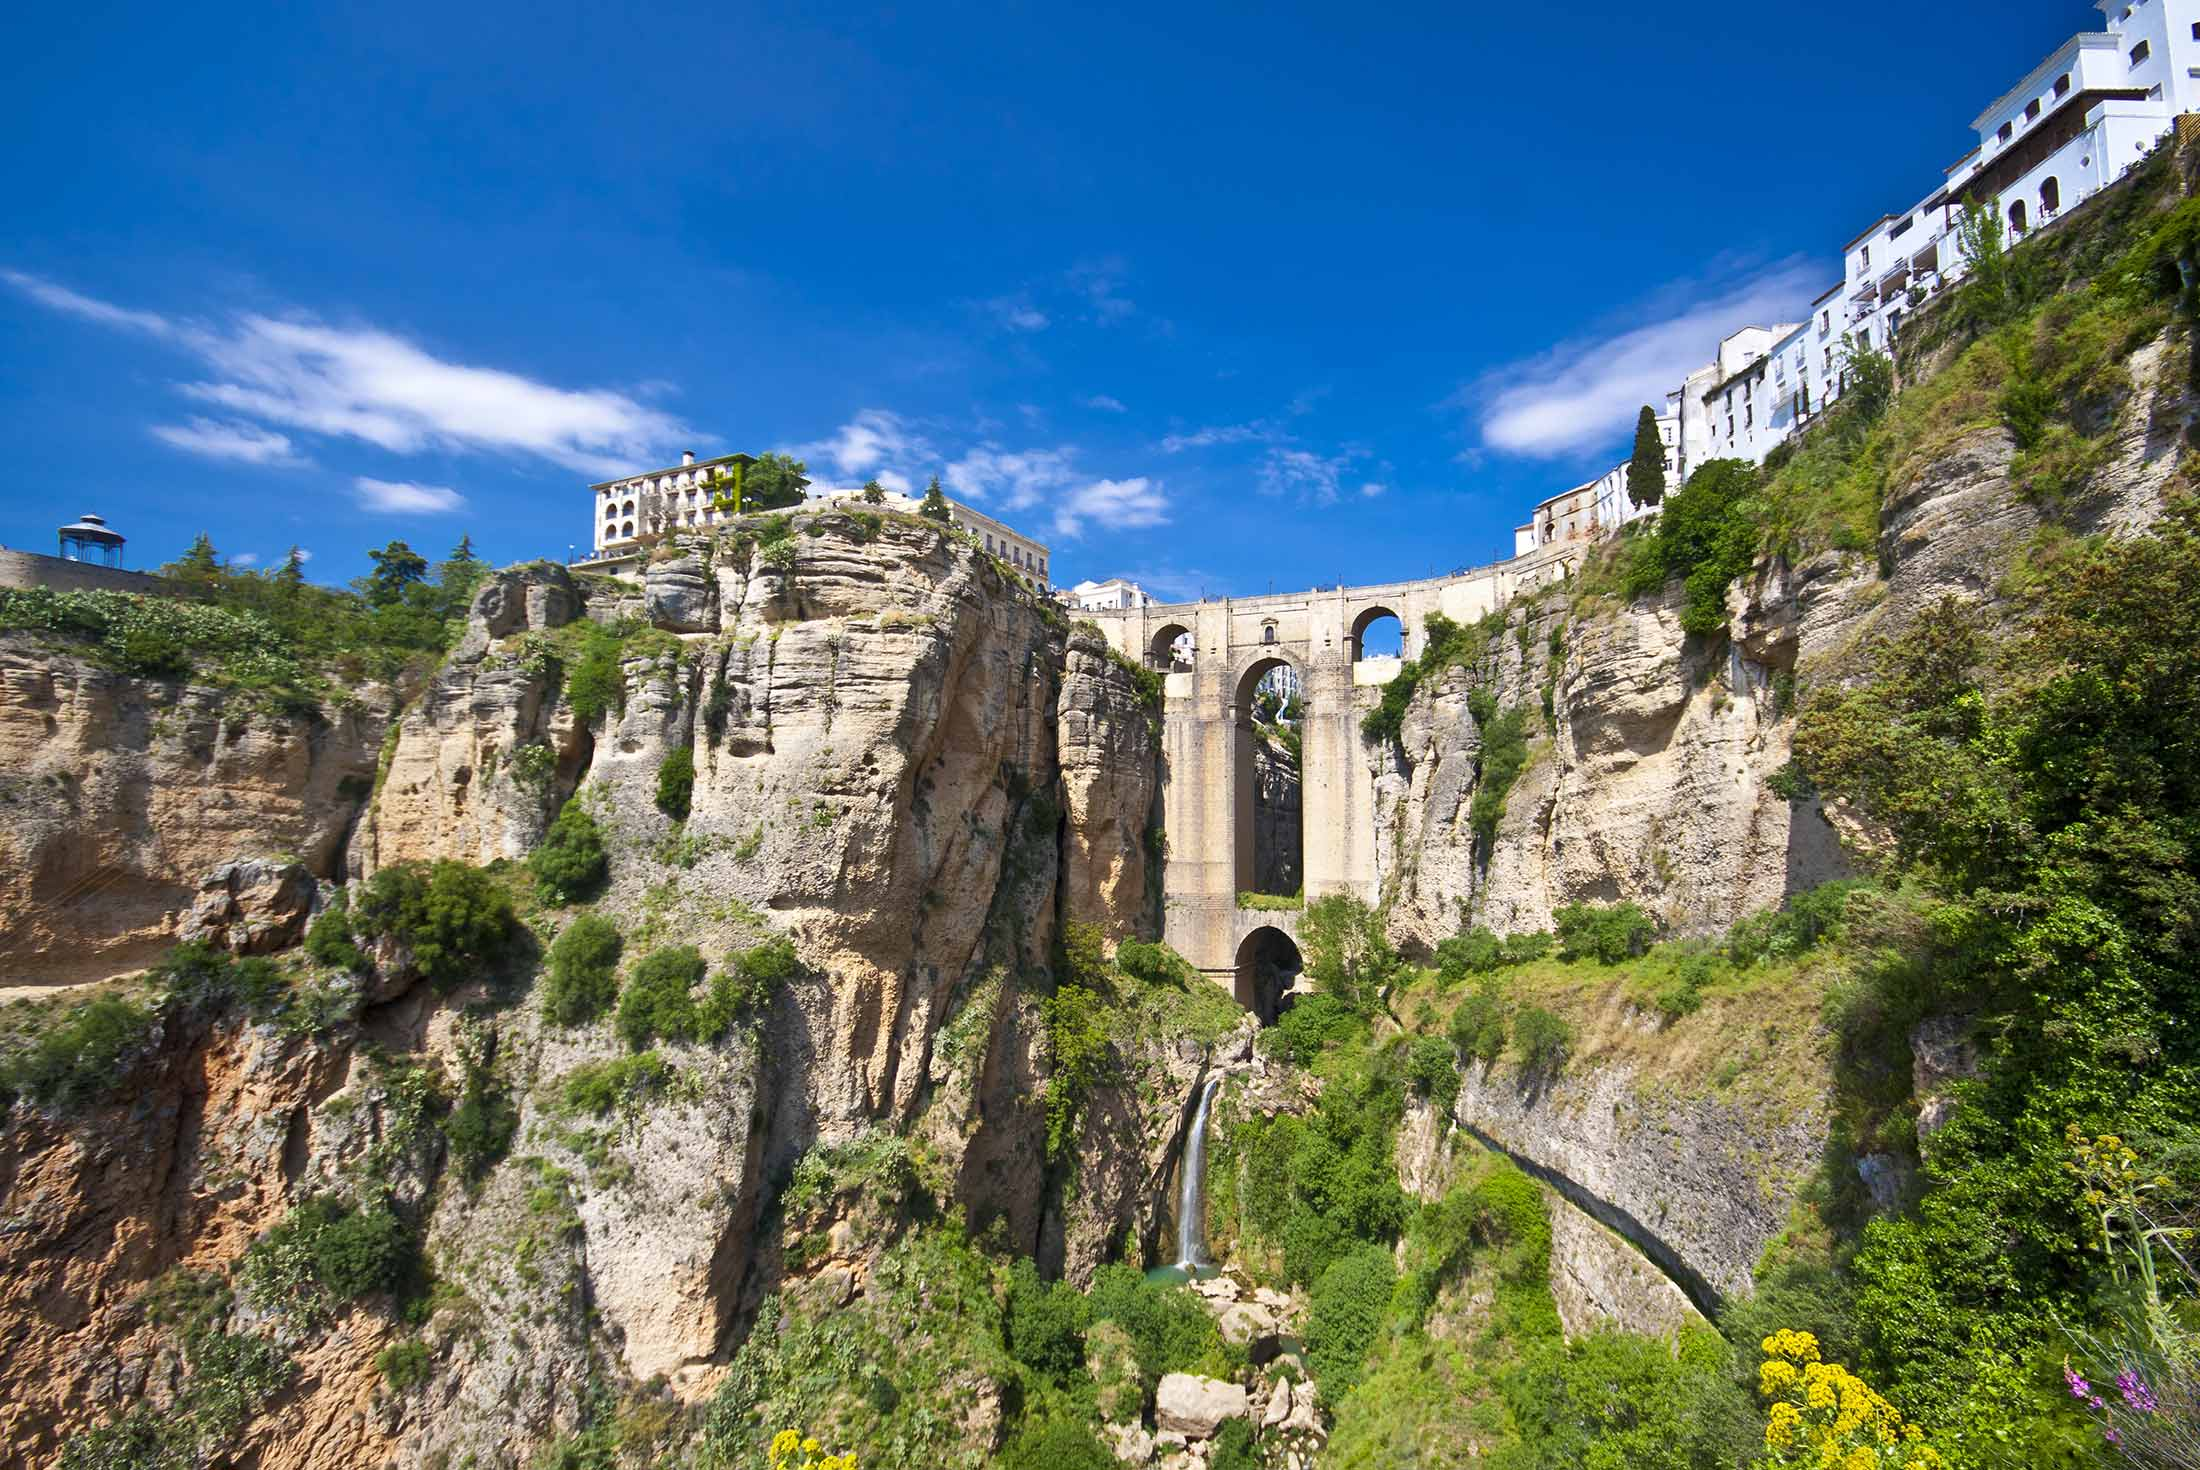 Cruising Spain and Portugal - Malaga to Lisbon 1